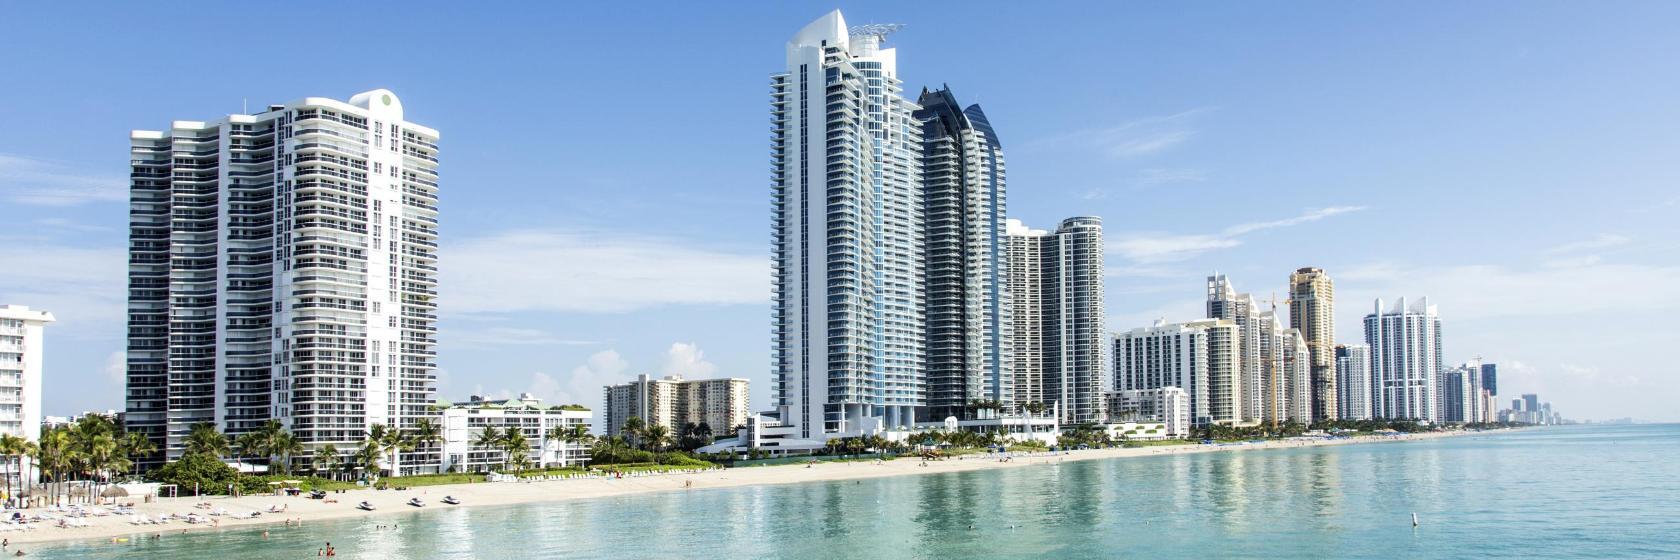 Miami Beach, Florida Hotels